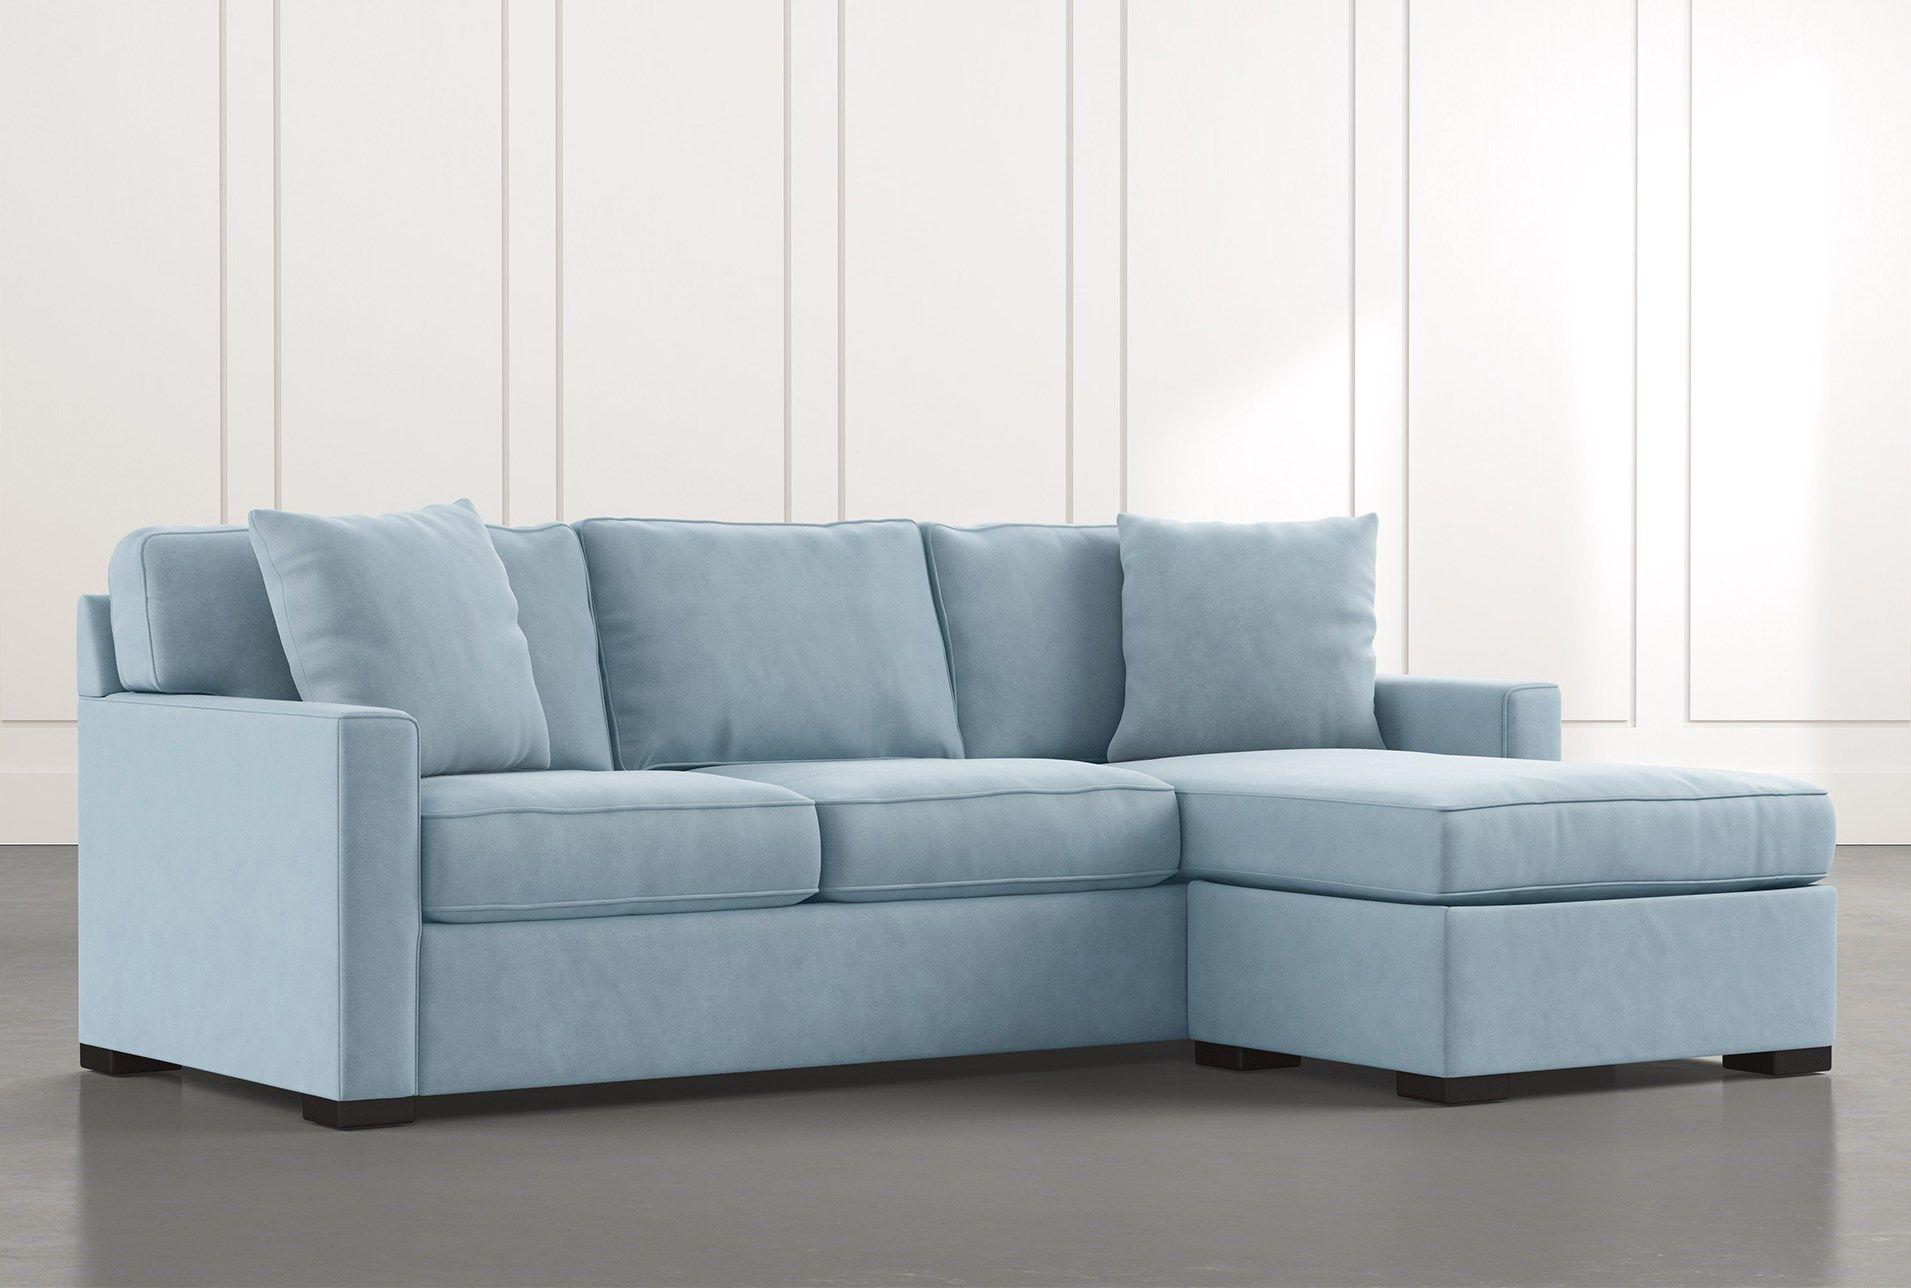 Taren Ii Light Blue Reversible Sofa Chaise Sleeper W Storage Ottoman Chaise Sofa Sectional Sofa Sofa